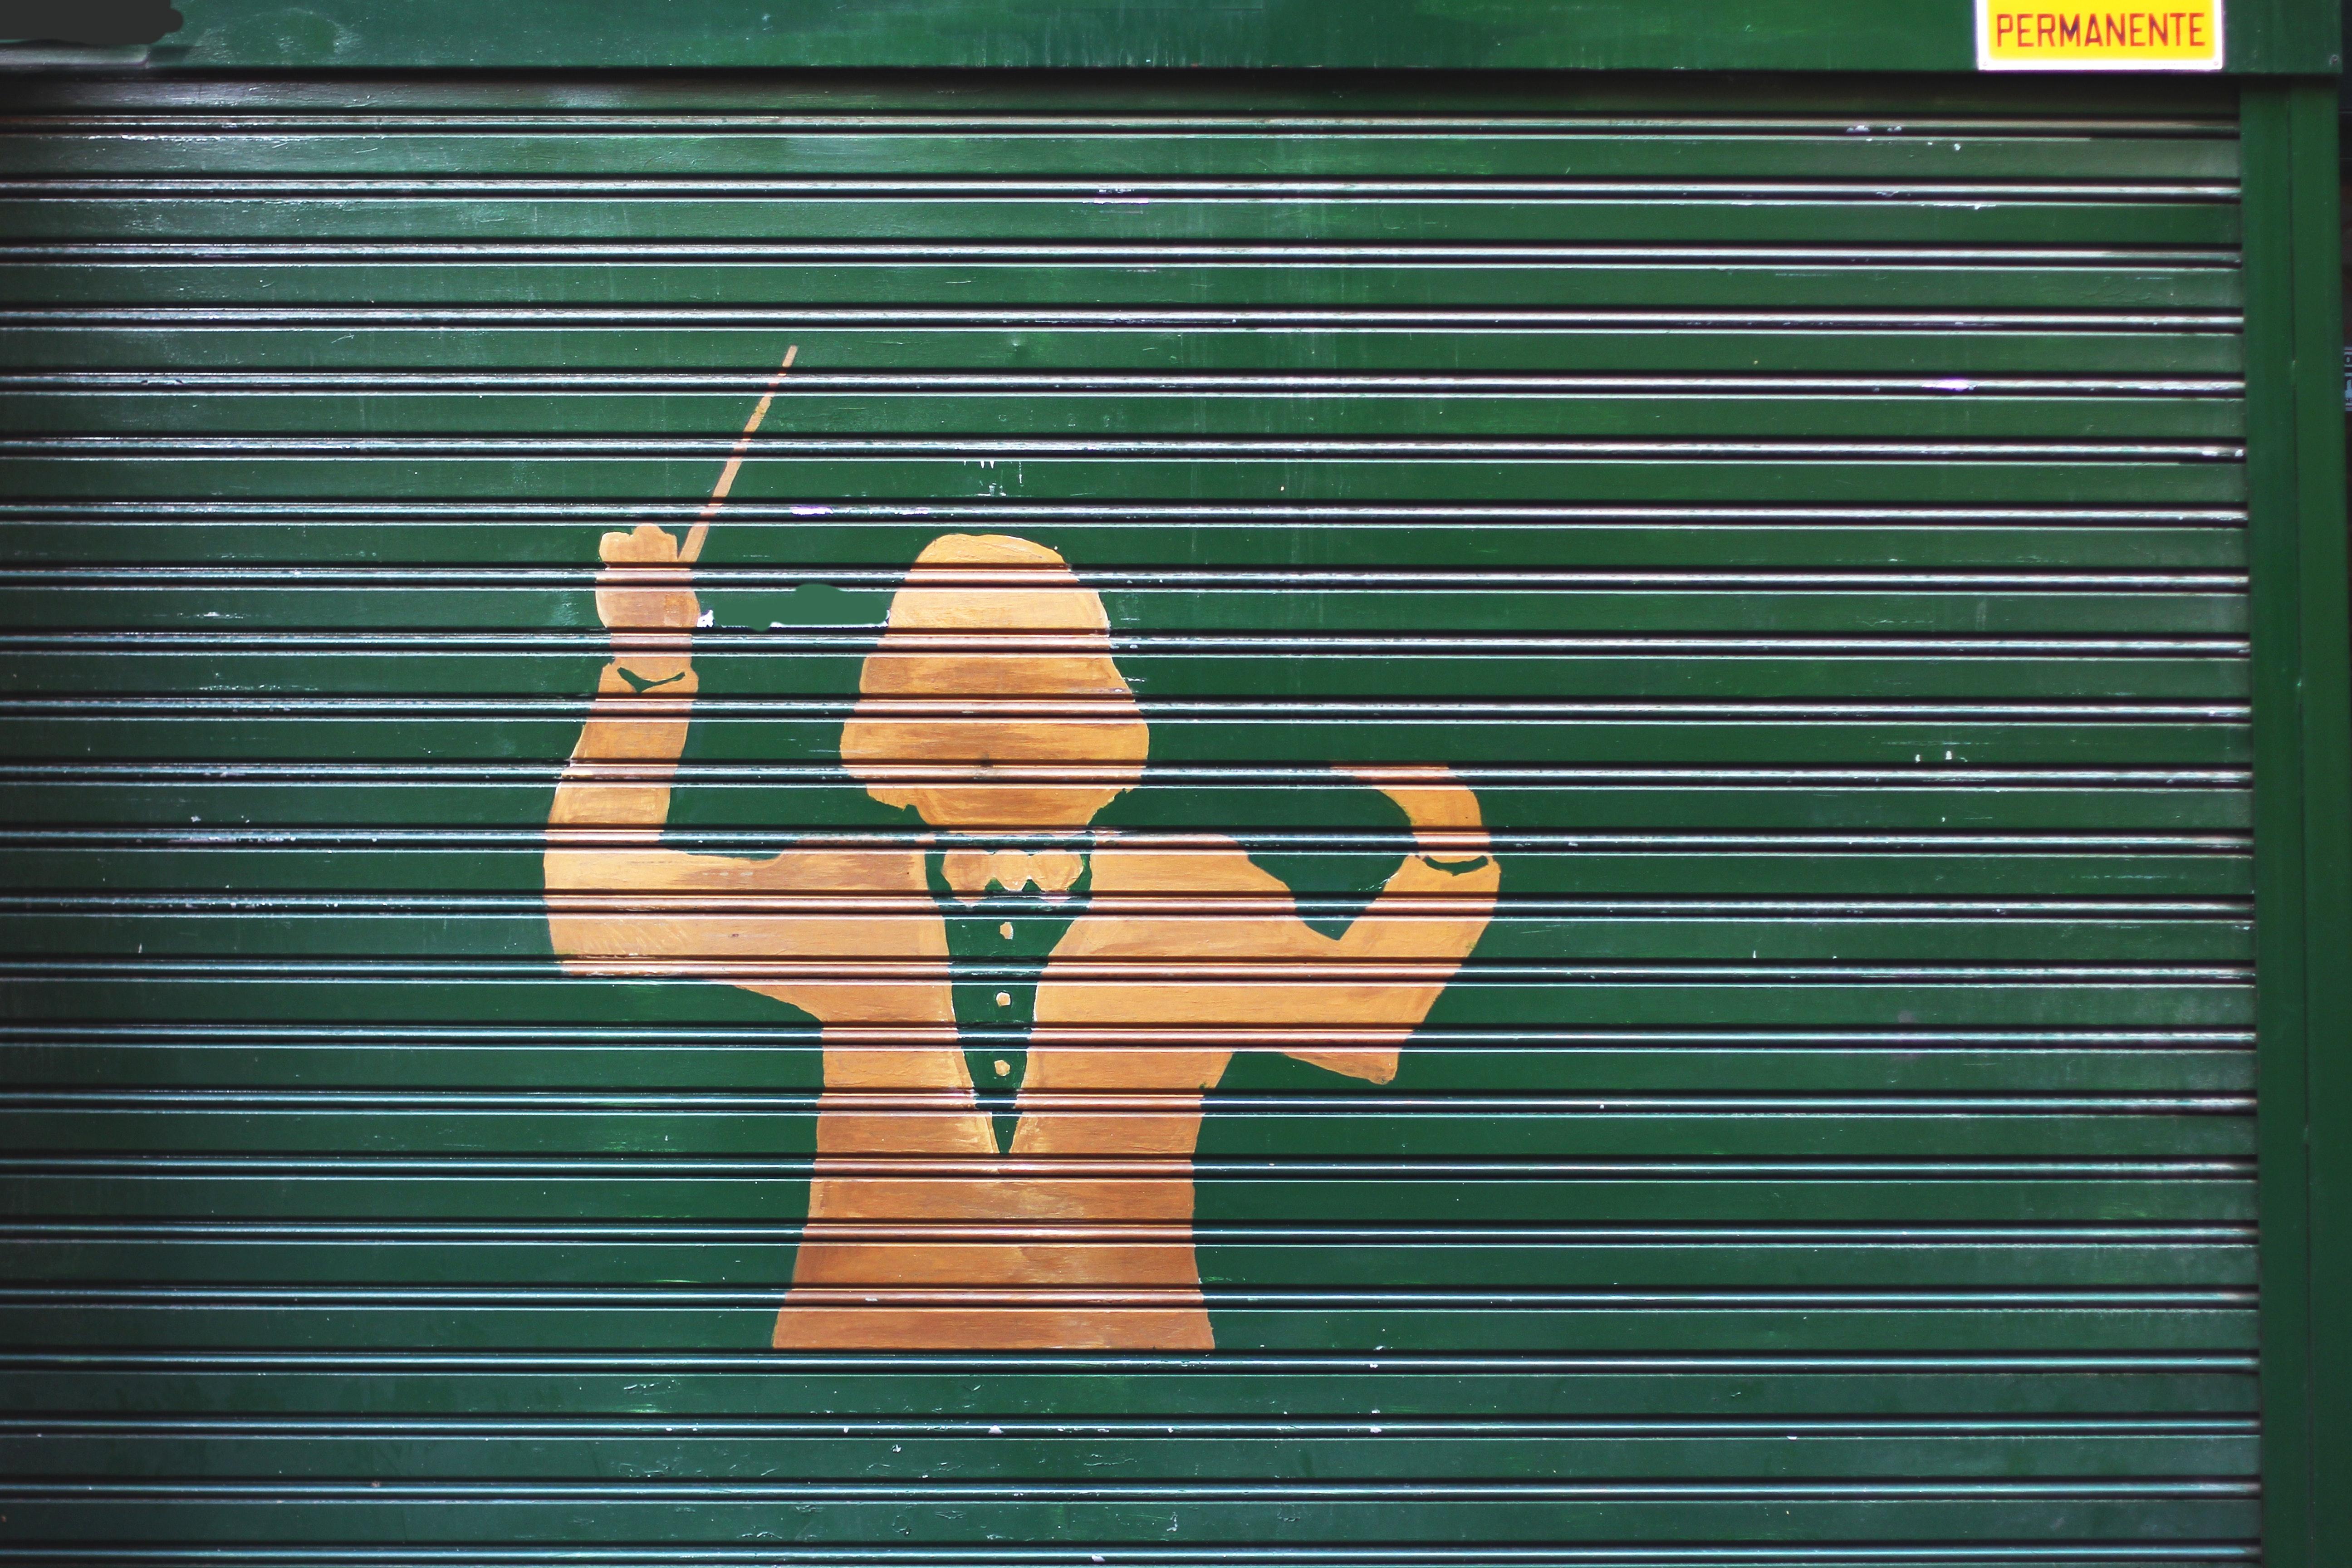 Dirigent symbolbild paedagoge gehalt.b8bd3fb4efe60c97b3bef24eec892d7fa